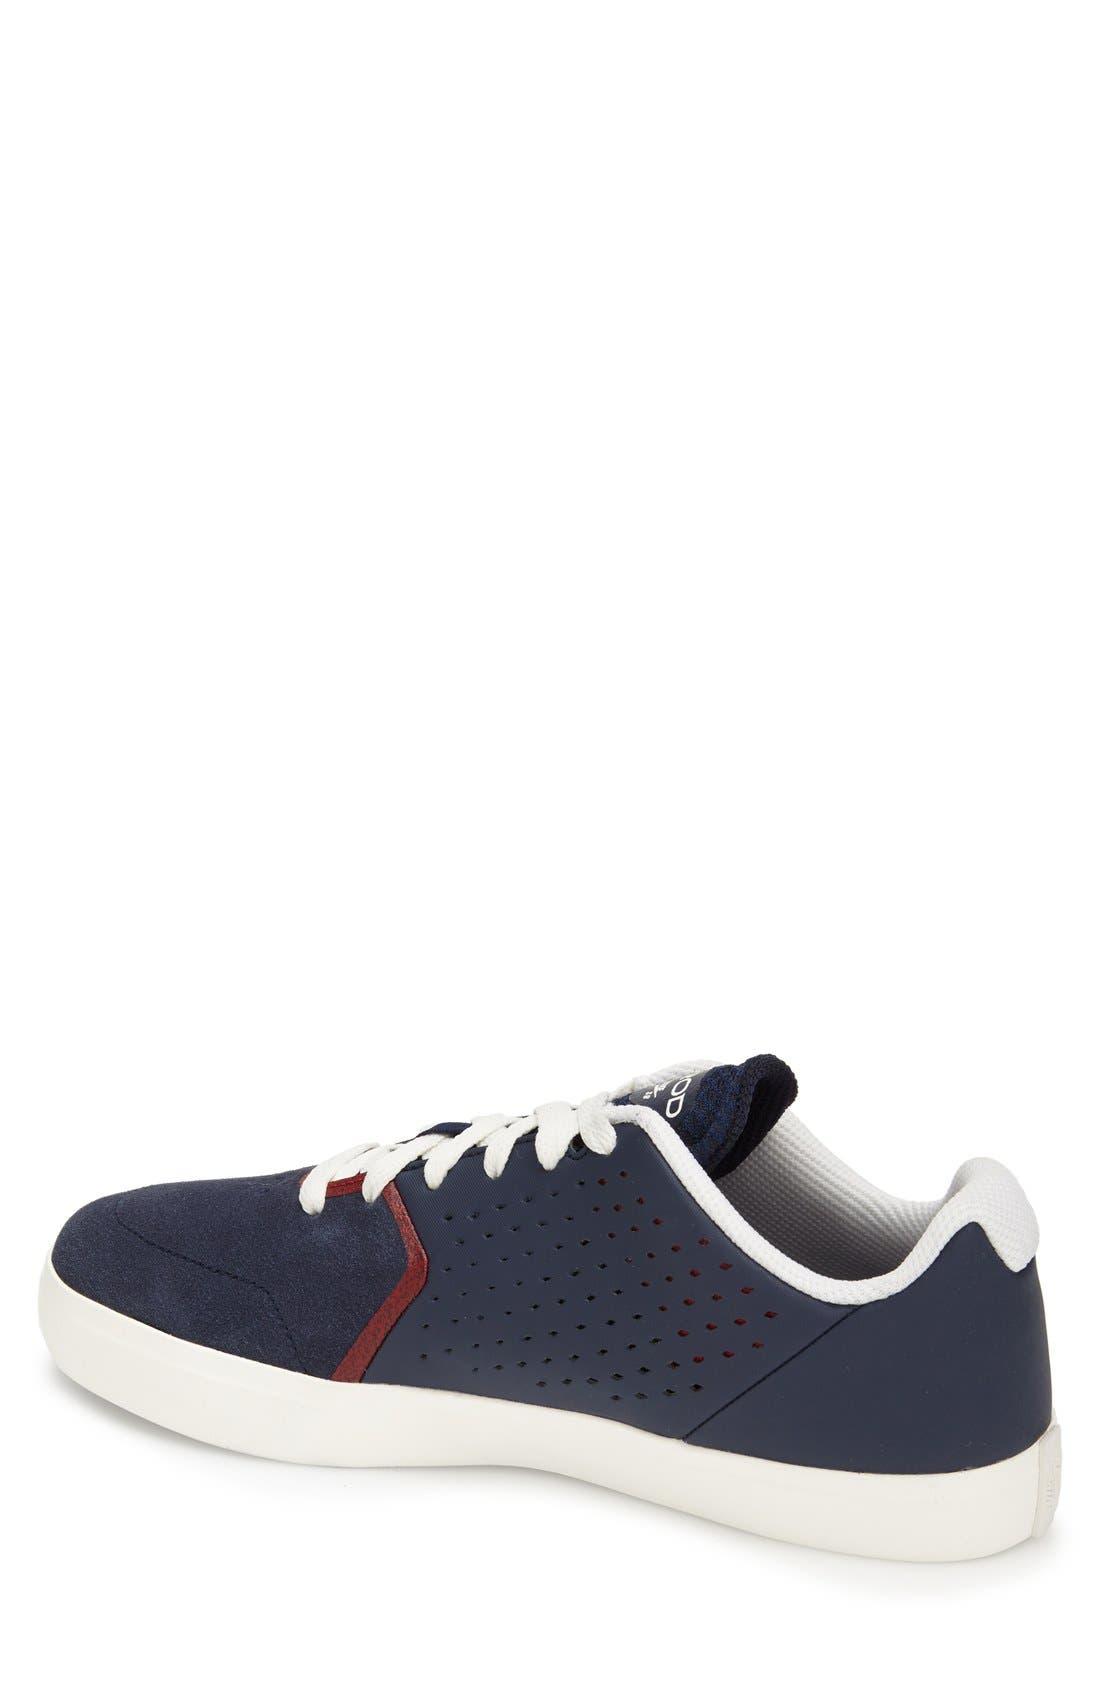 Alternate Image 2  - Nike 'Paul Rodriguez CTD LR SB' Skate Shoe (Men)